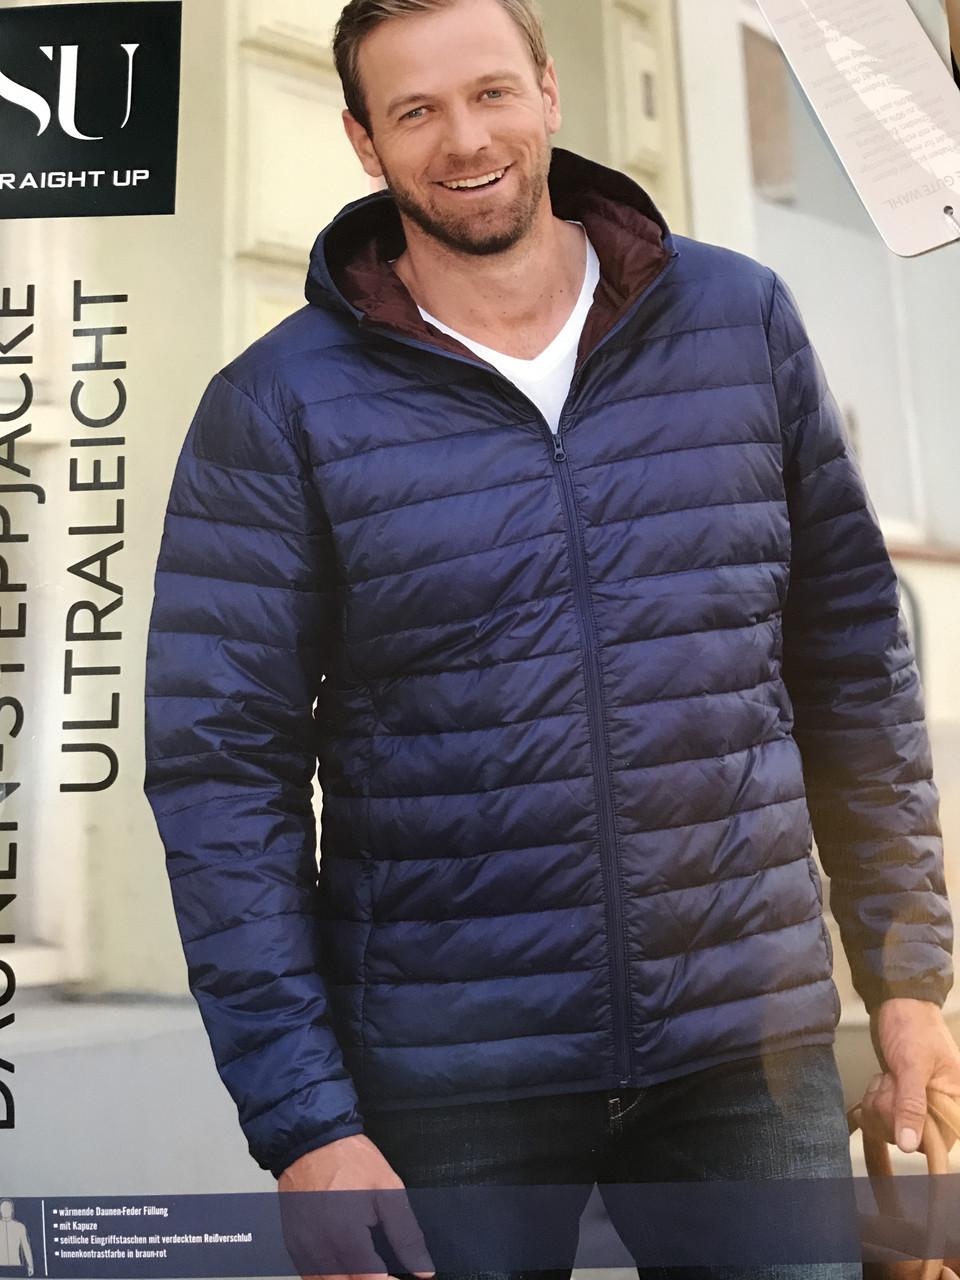 Мужская демисезонная куртка Straight Up Размер XL